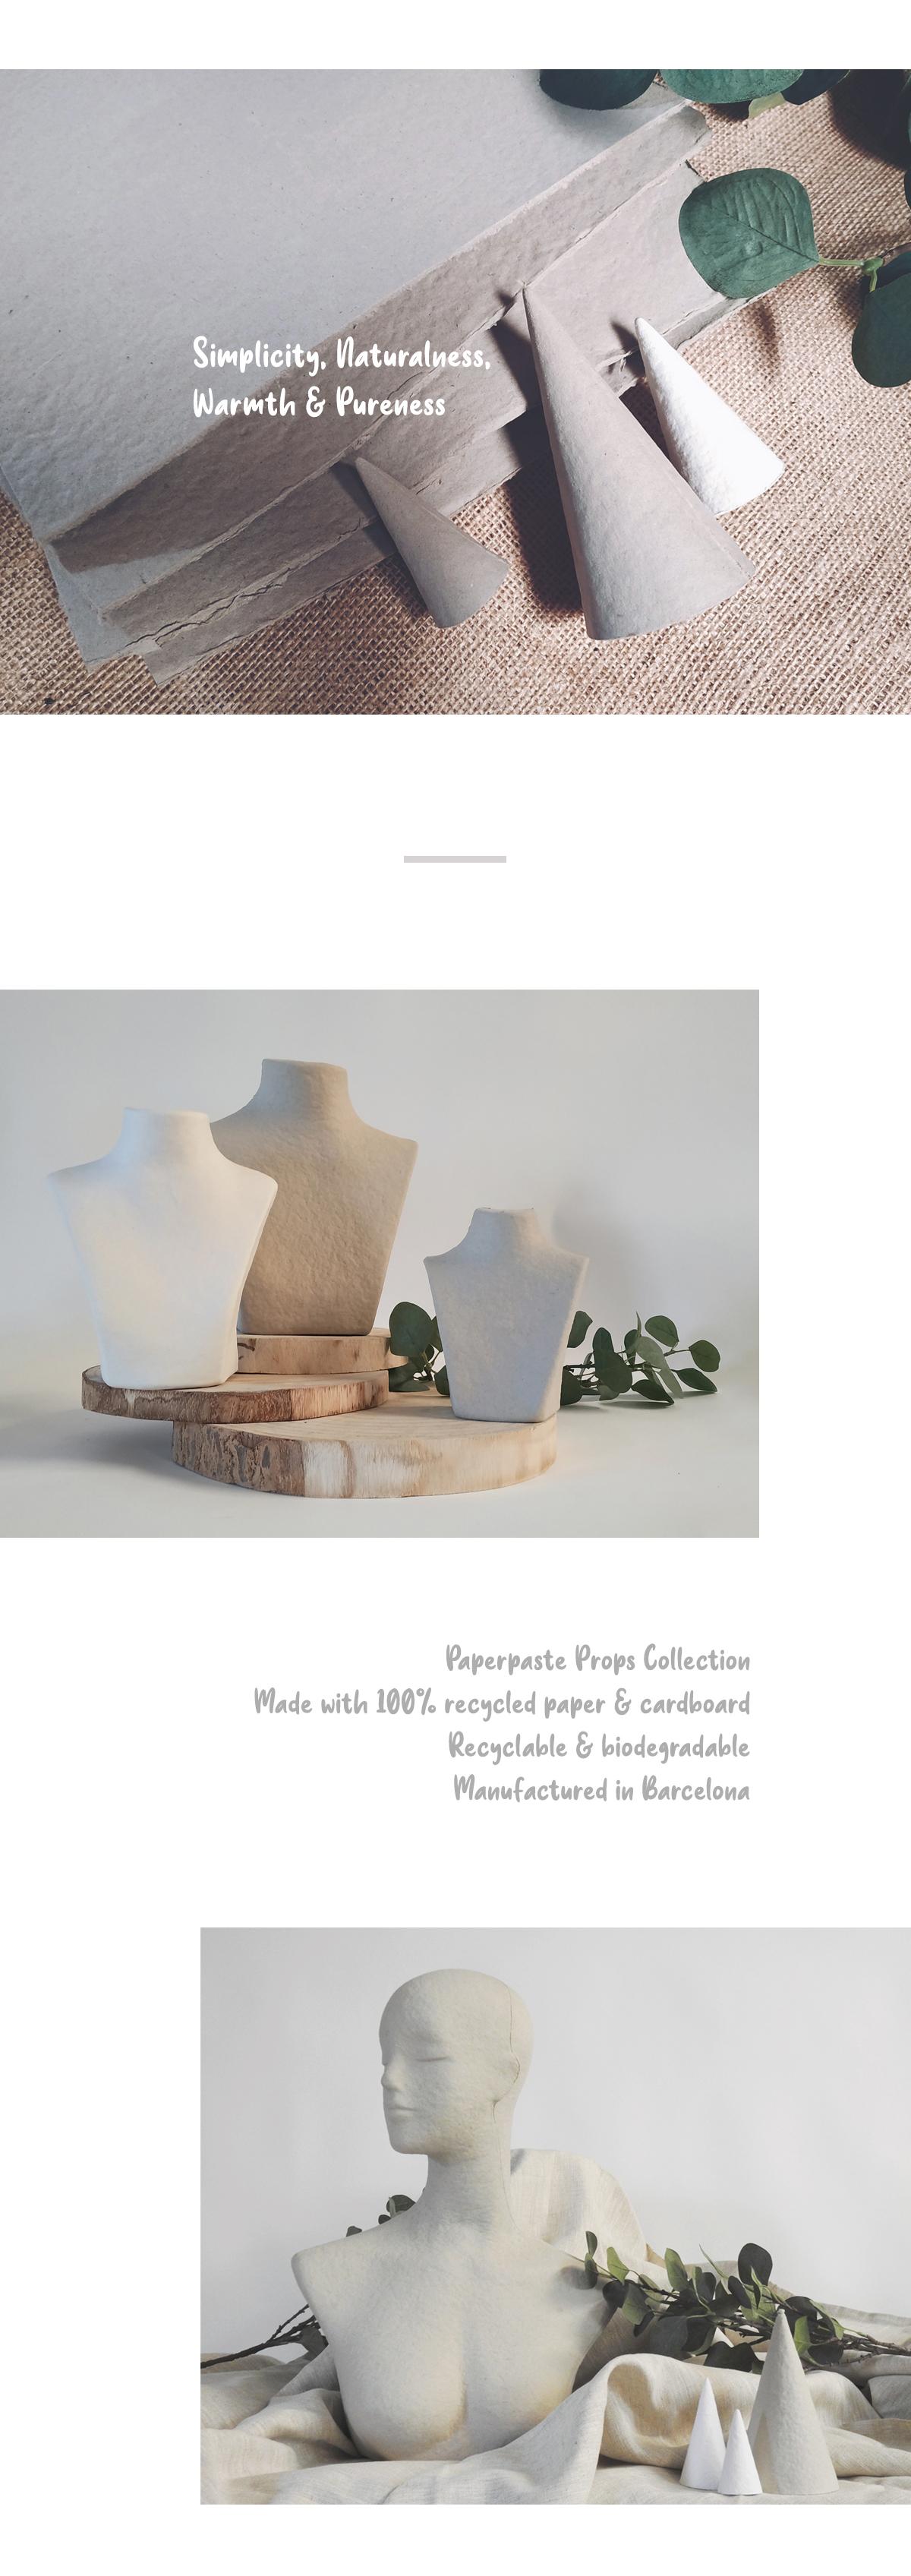 props-accessories-paper-pulp